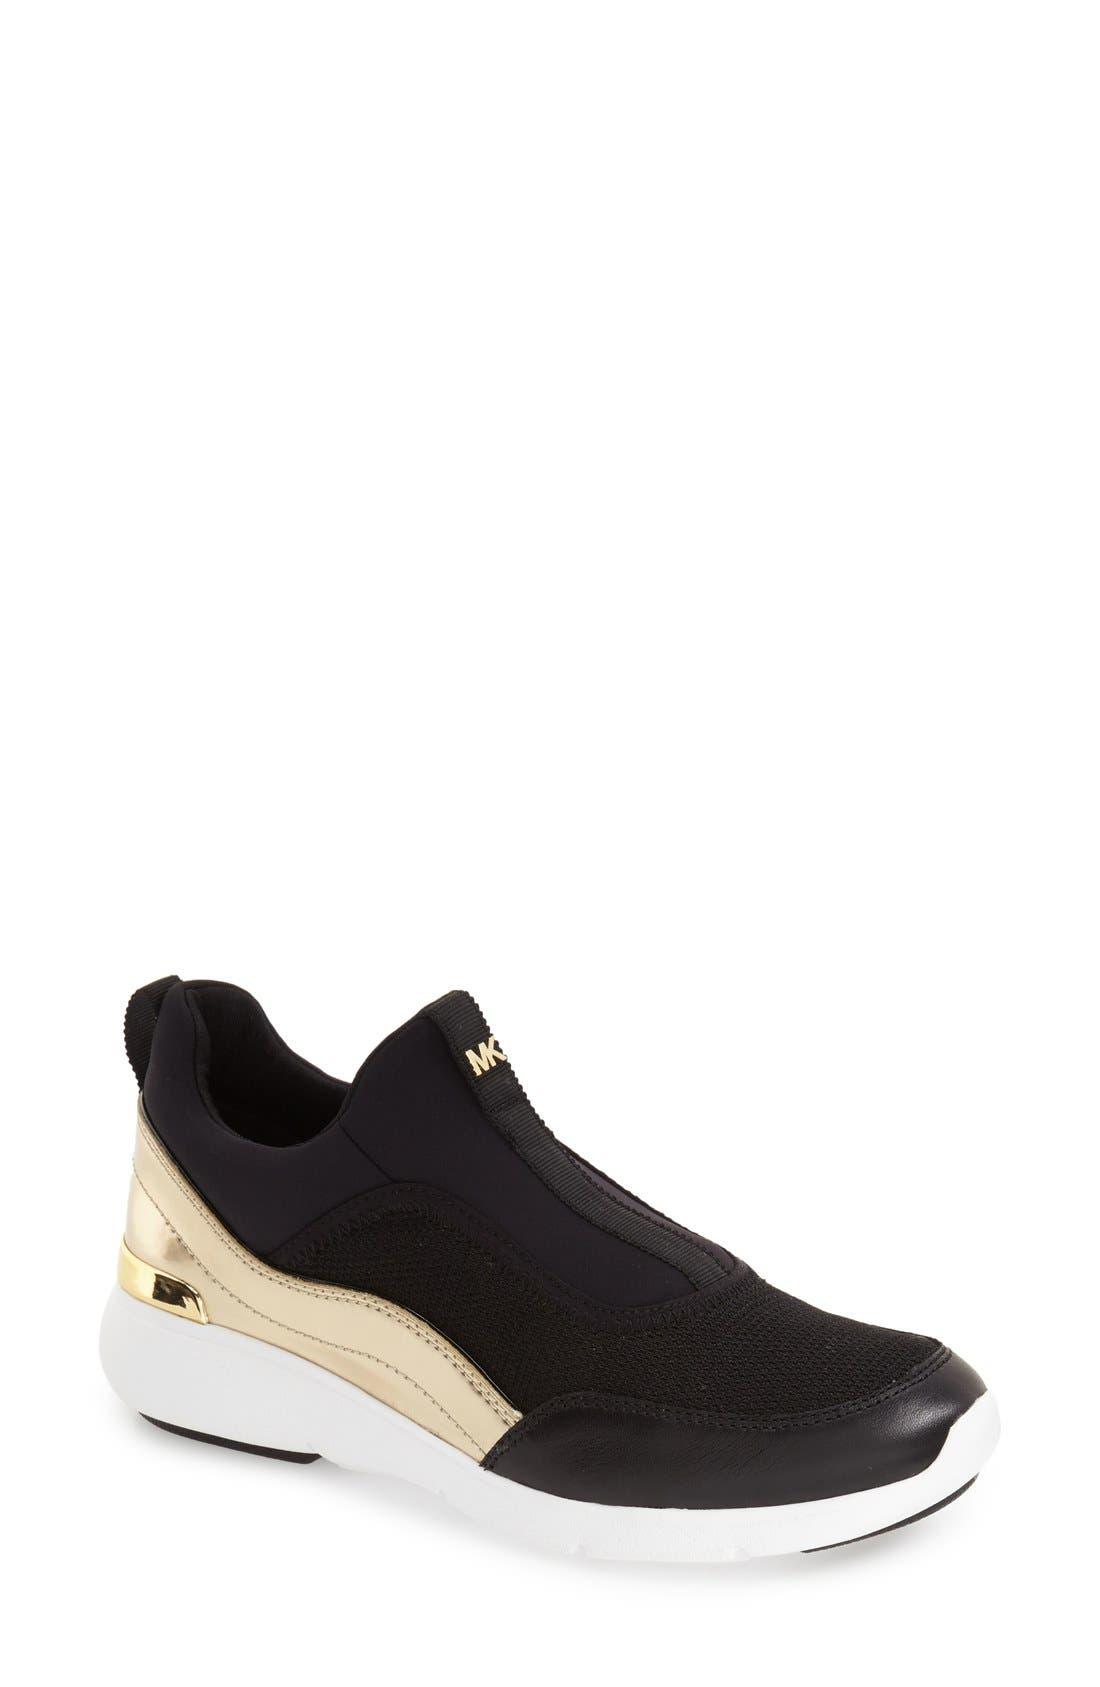 Main Image - MICHAEL Michael Kors 'Ace' Sneaker (Women)